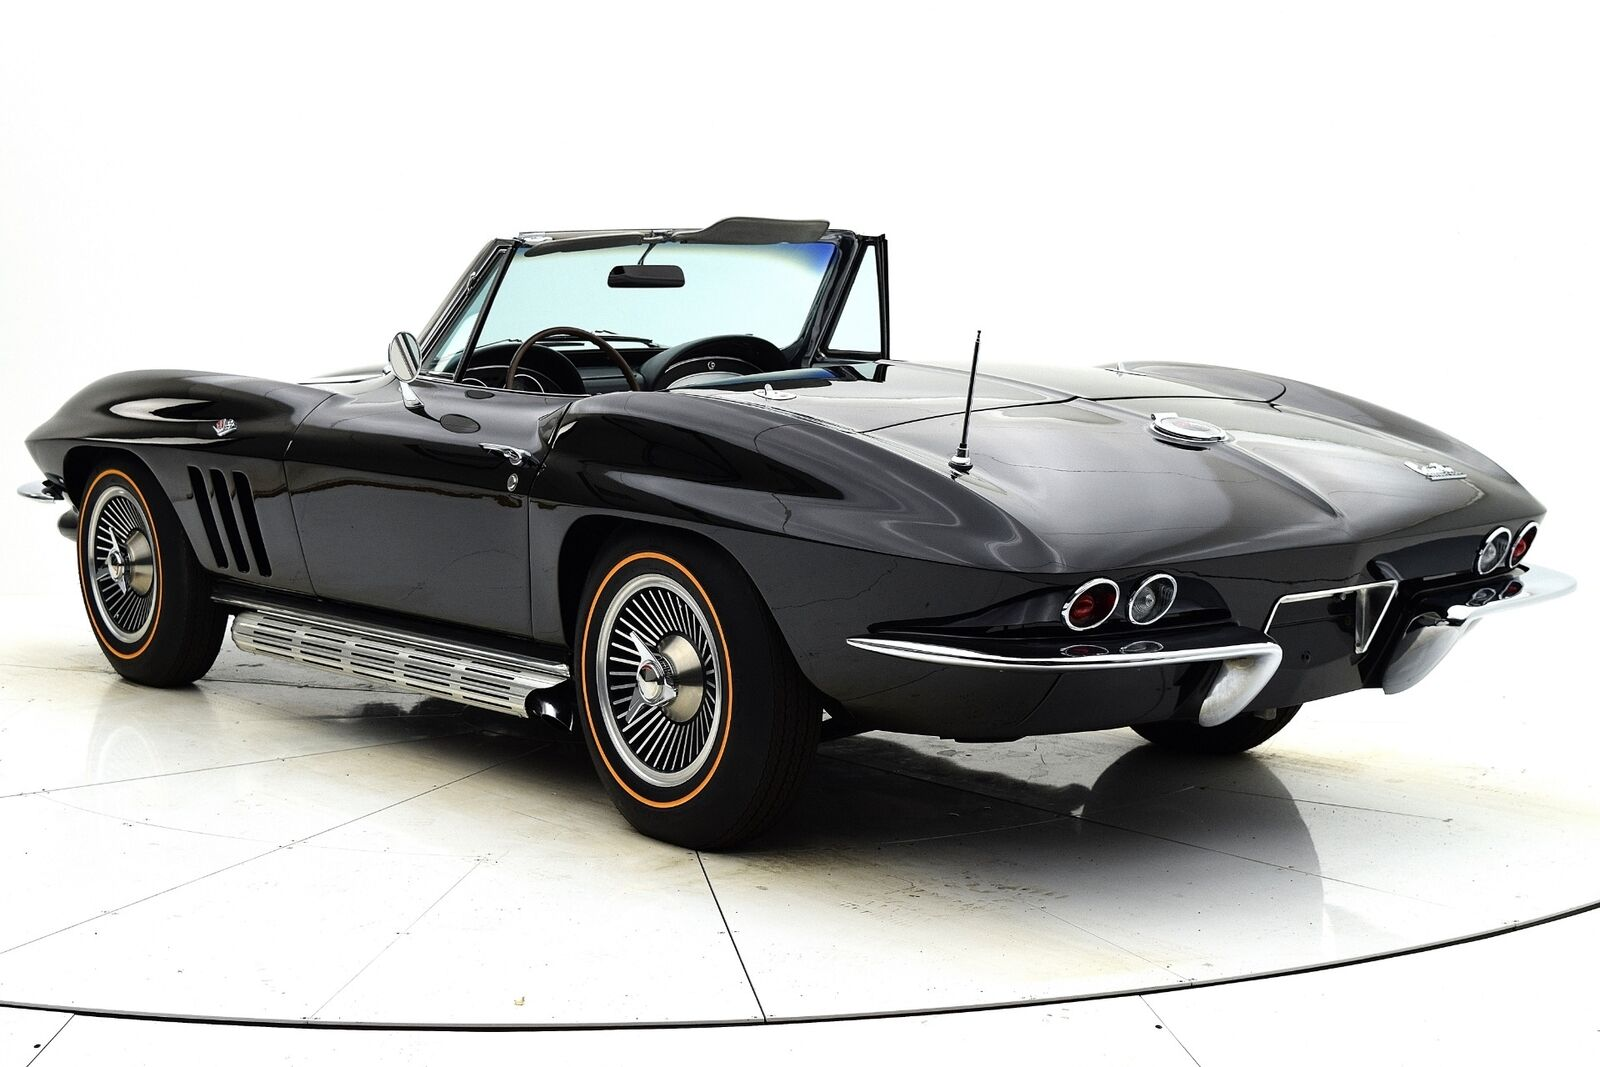 1966 Black Chevrolet Corvette Convertible  | C2 Corvette Photo 4